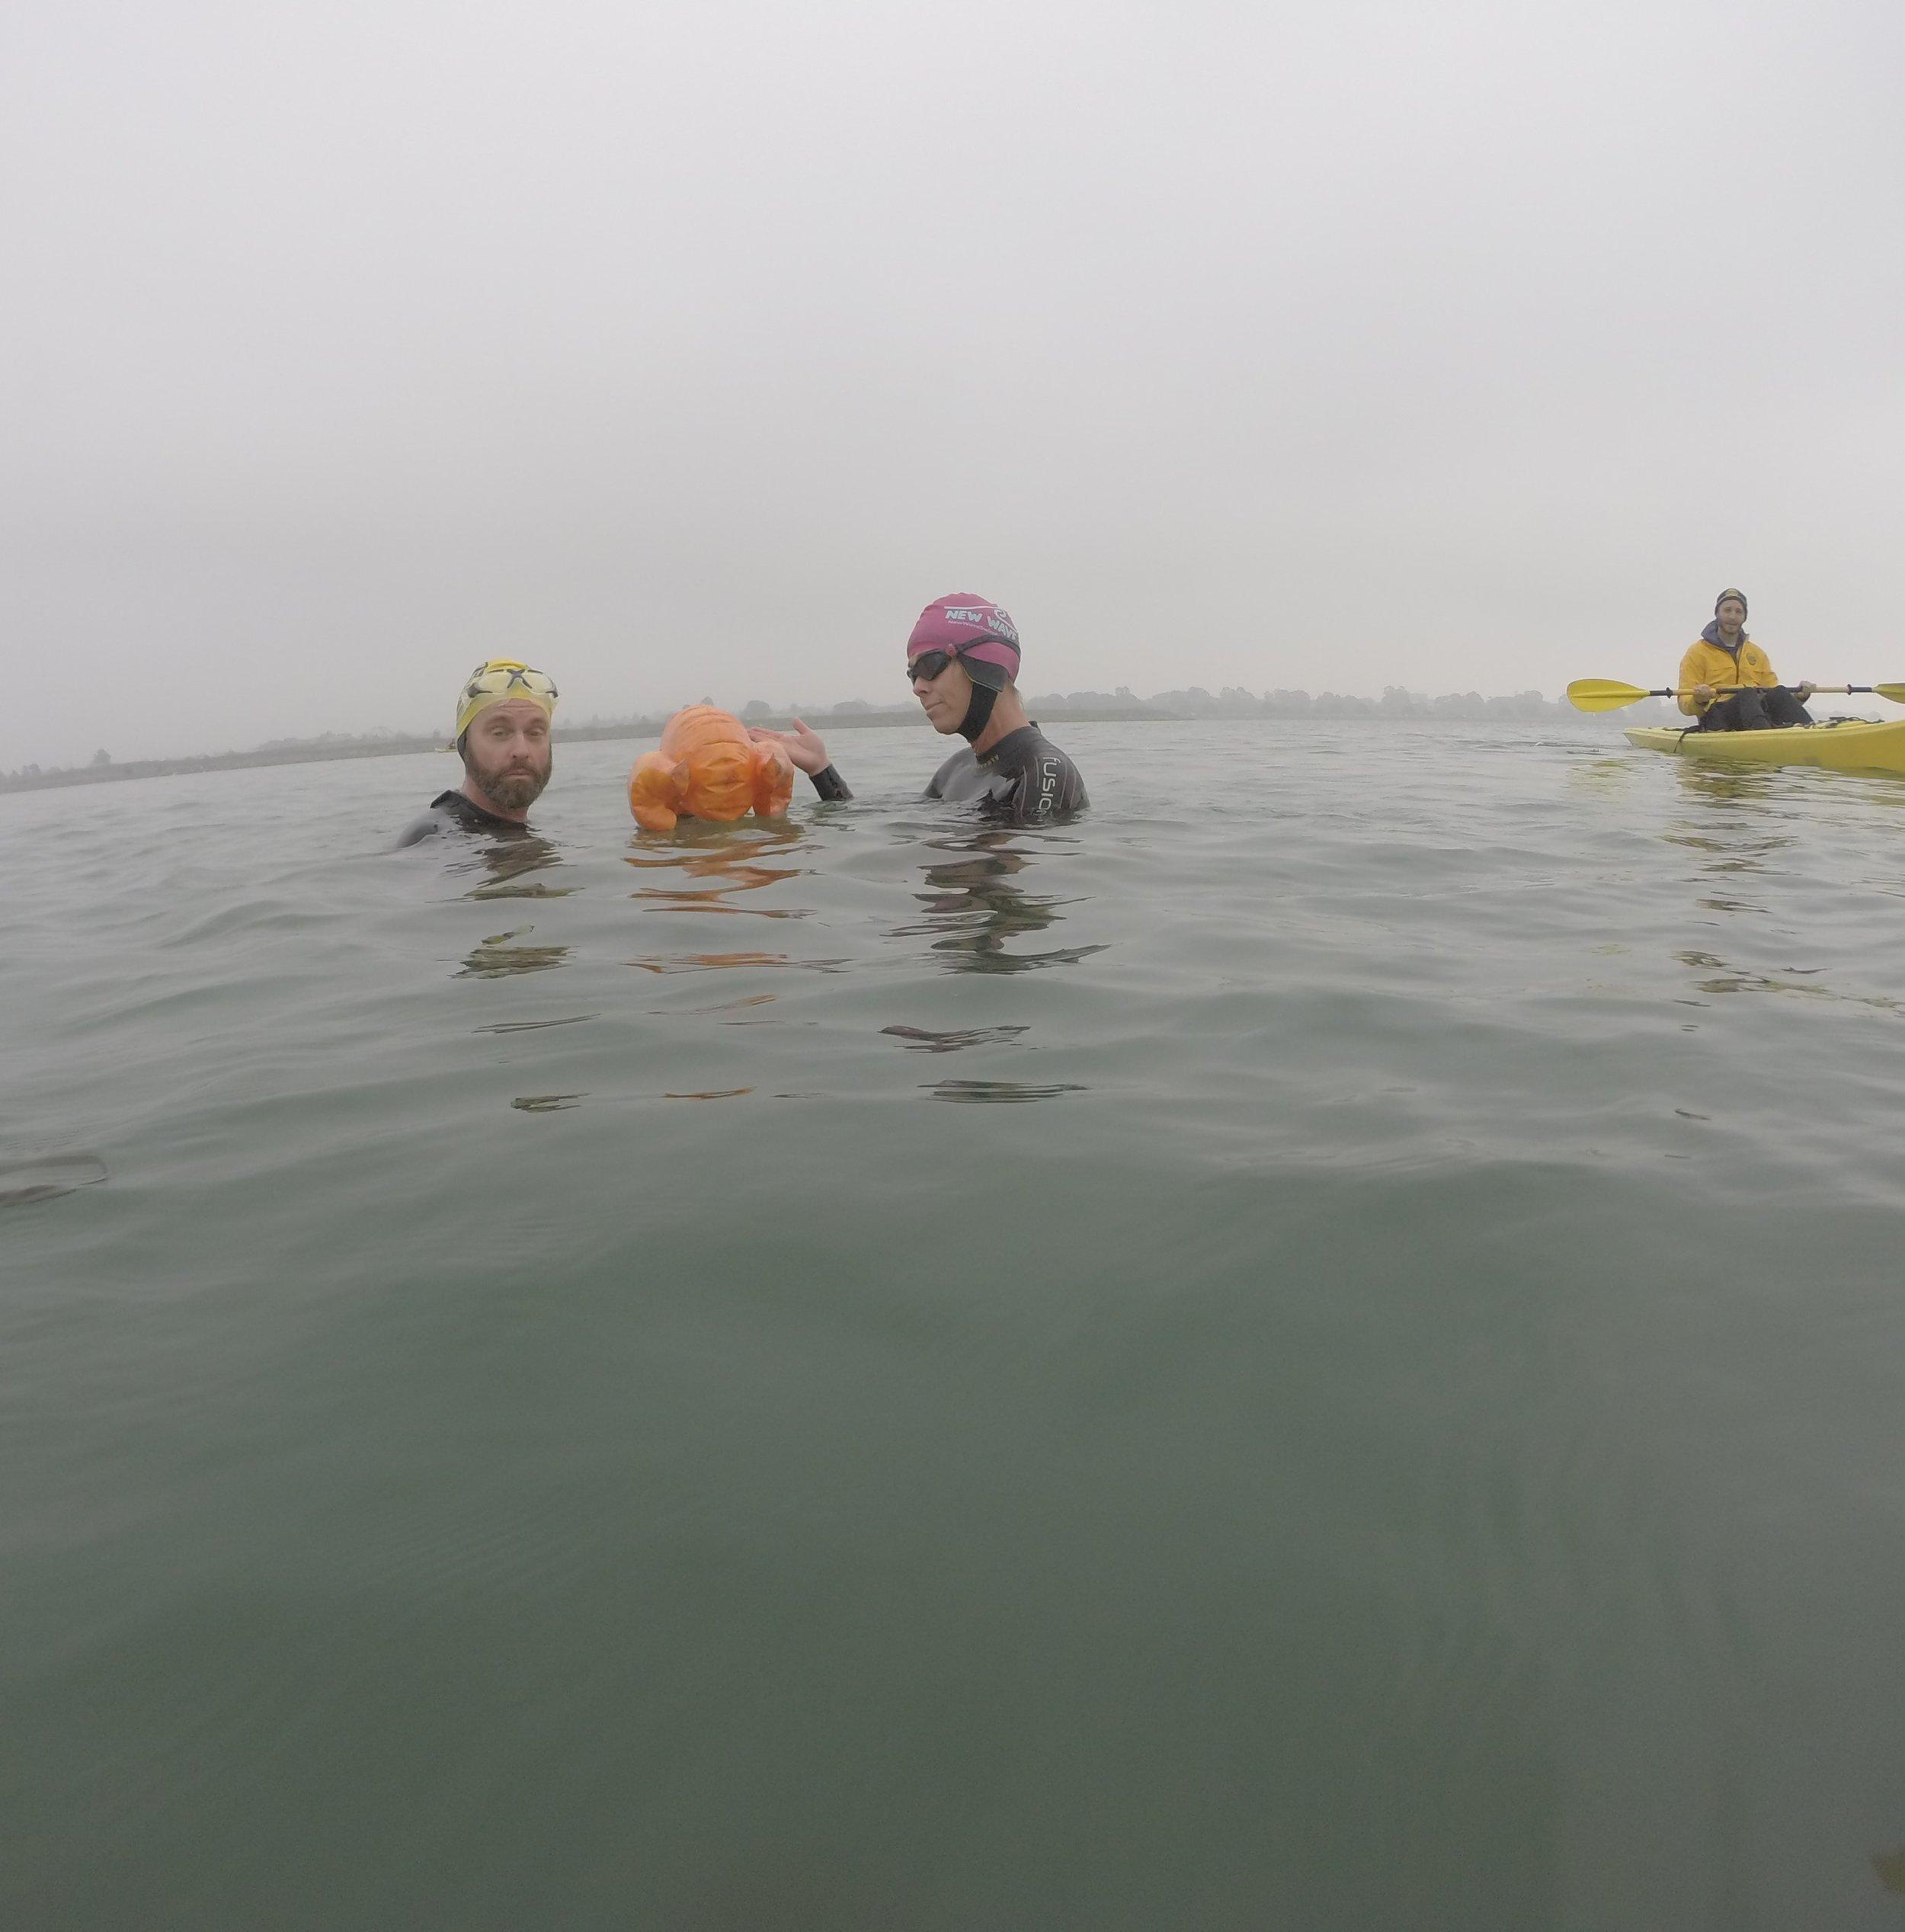 OdysseySwimmerProfileLillie.JPG